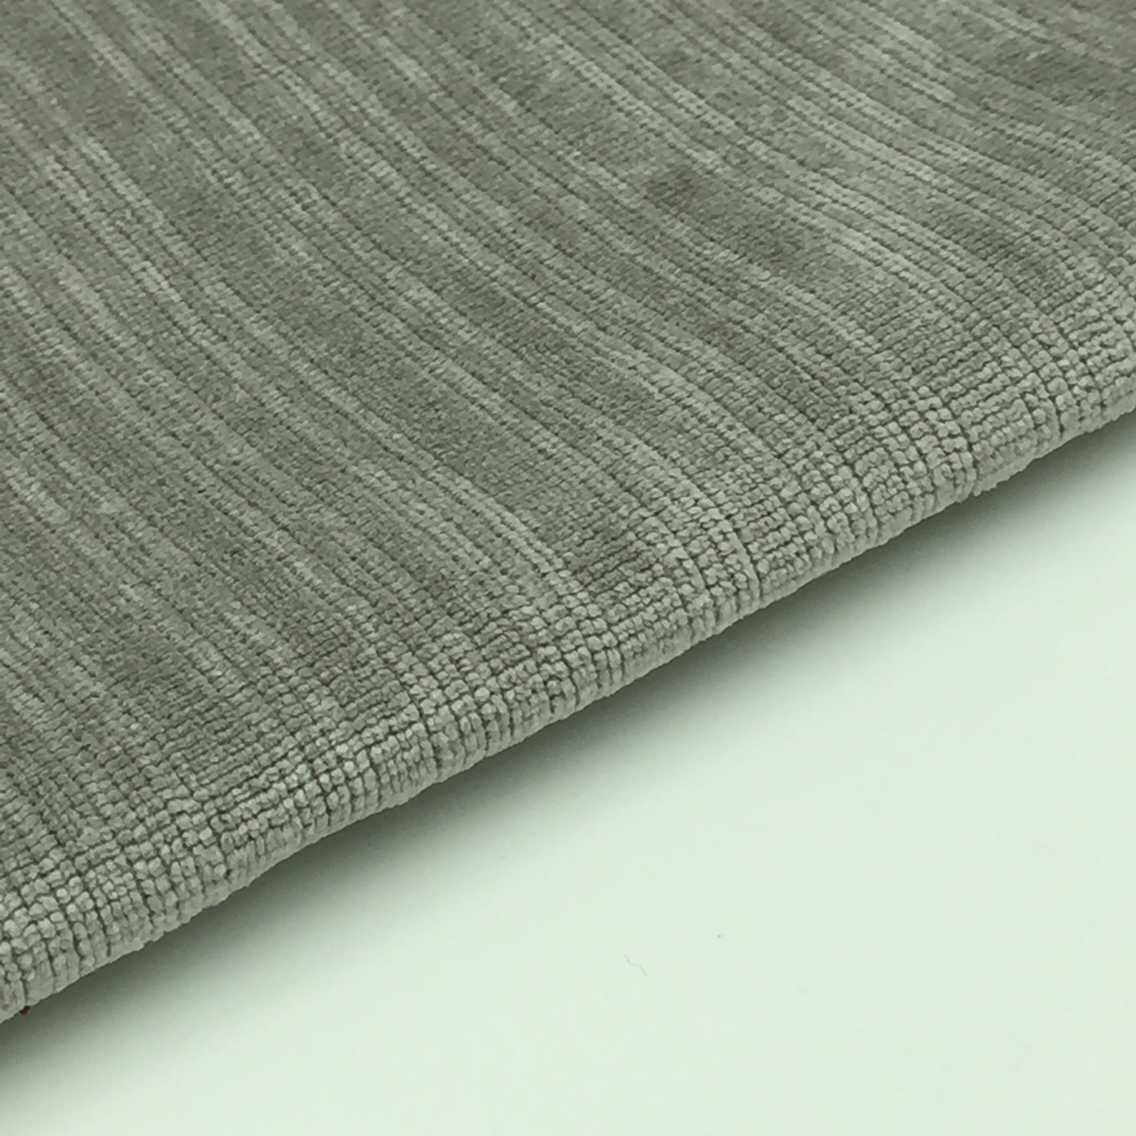 friheten corner sofa bed skiftebo beige black leather round ikea replacement cover – nazarm.com